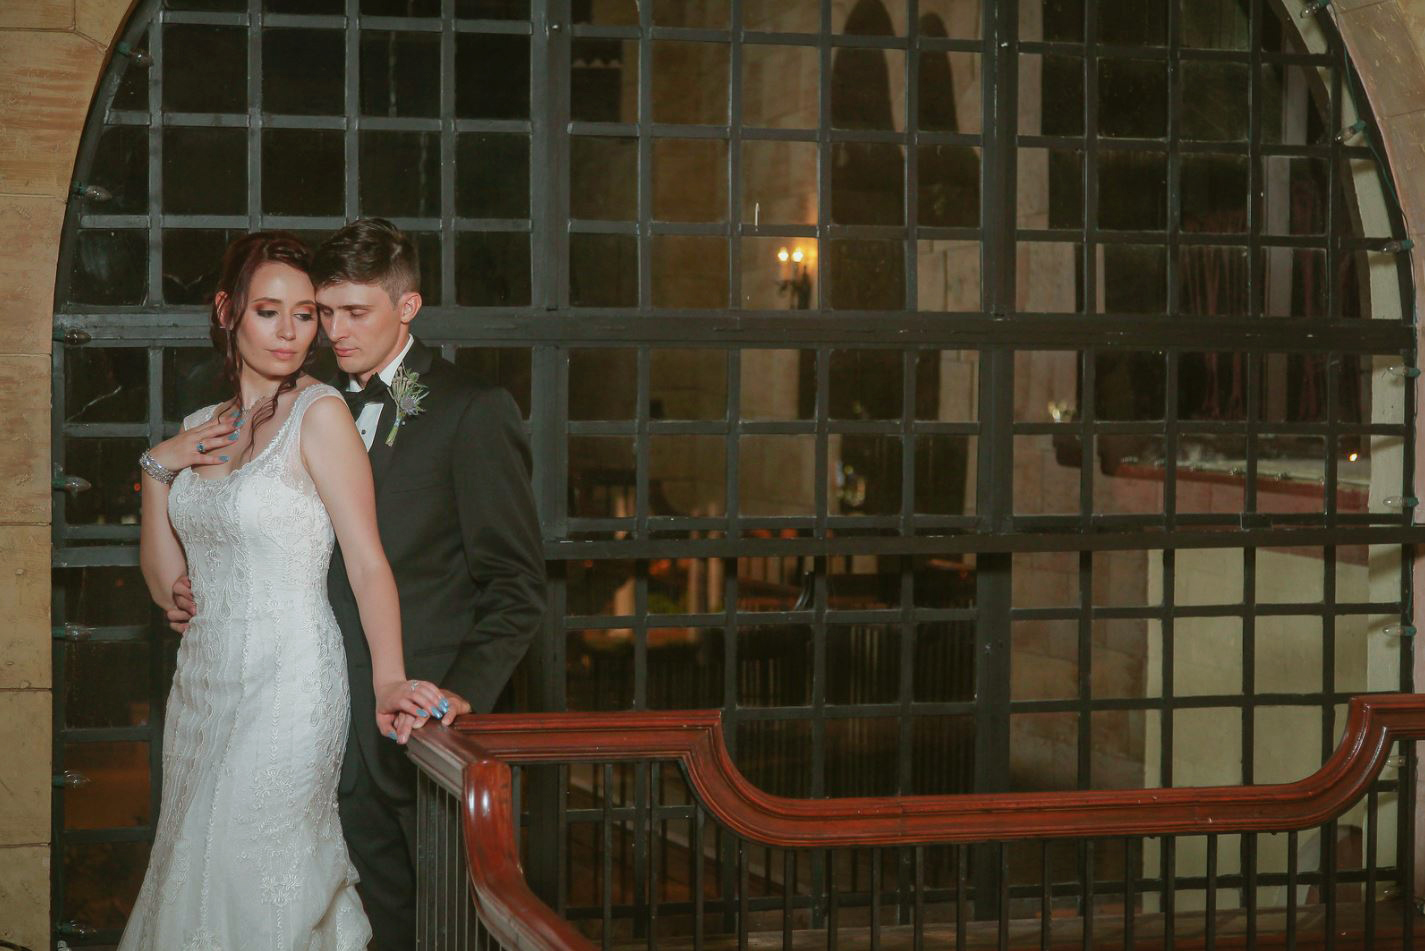 29-Treasury-onthe-plaza-SaintAugustine-wedding-photographer-jarstudio.JPG